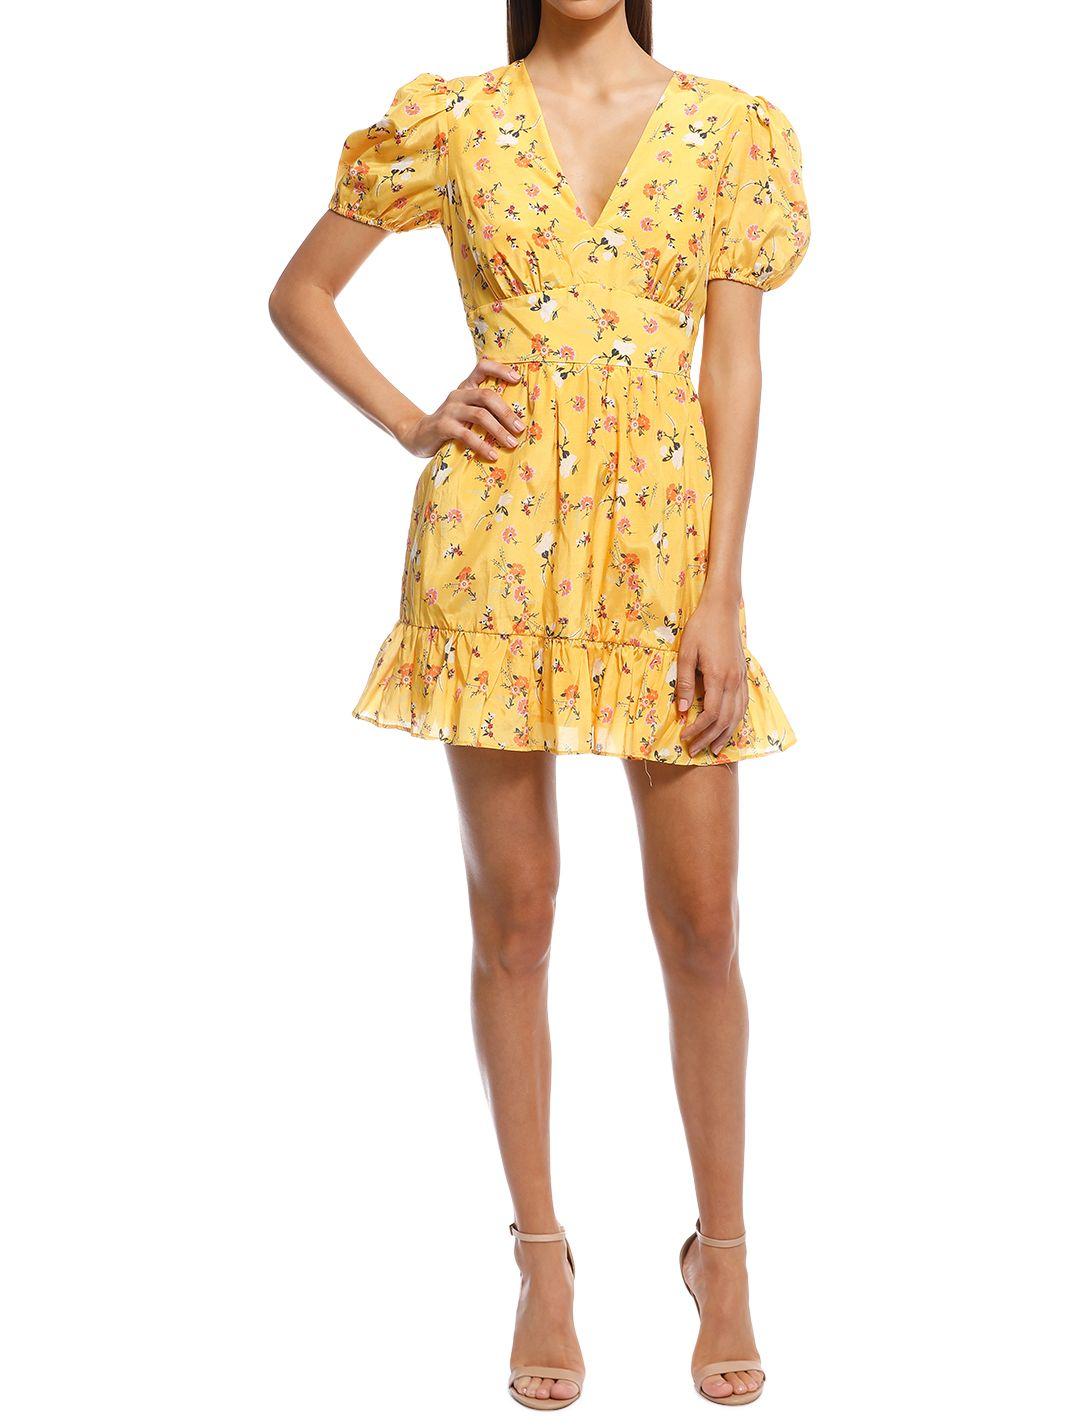 Talulah - Tansy Mini Dress - Yellow - Front